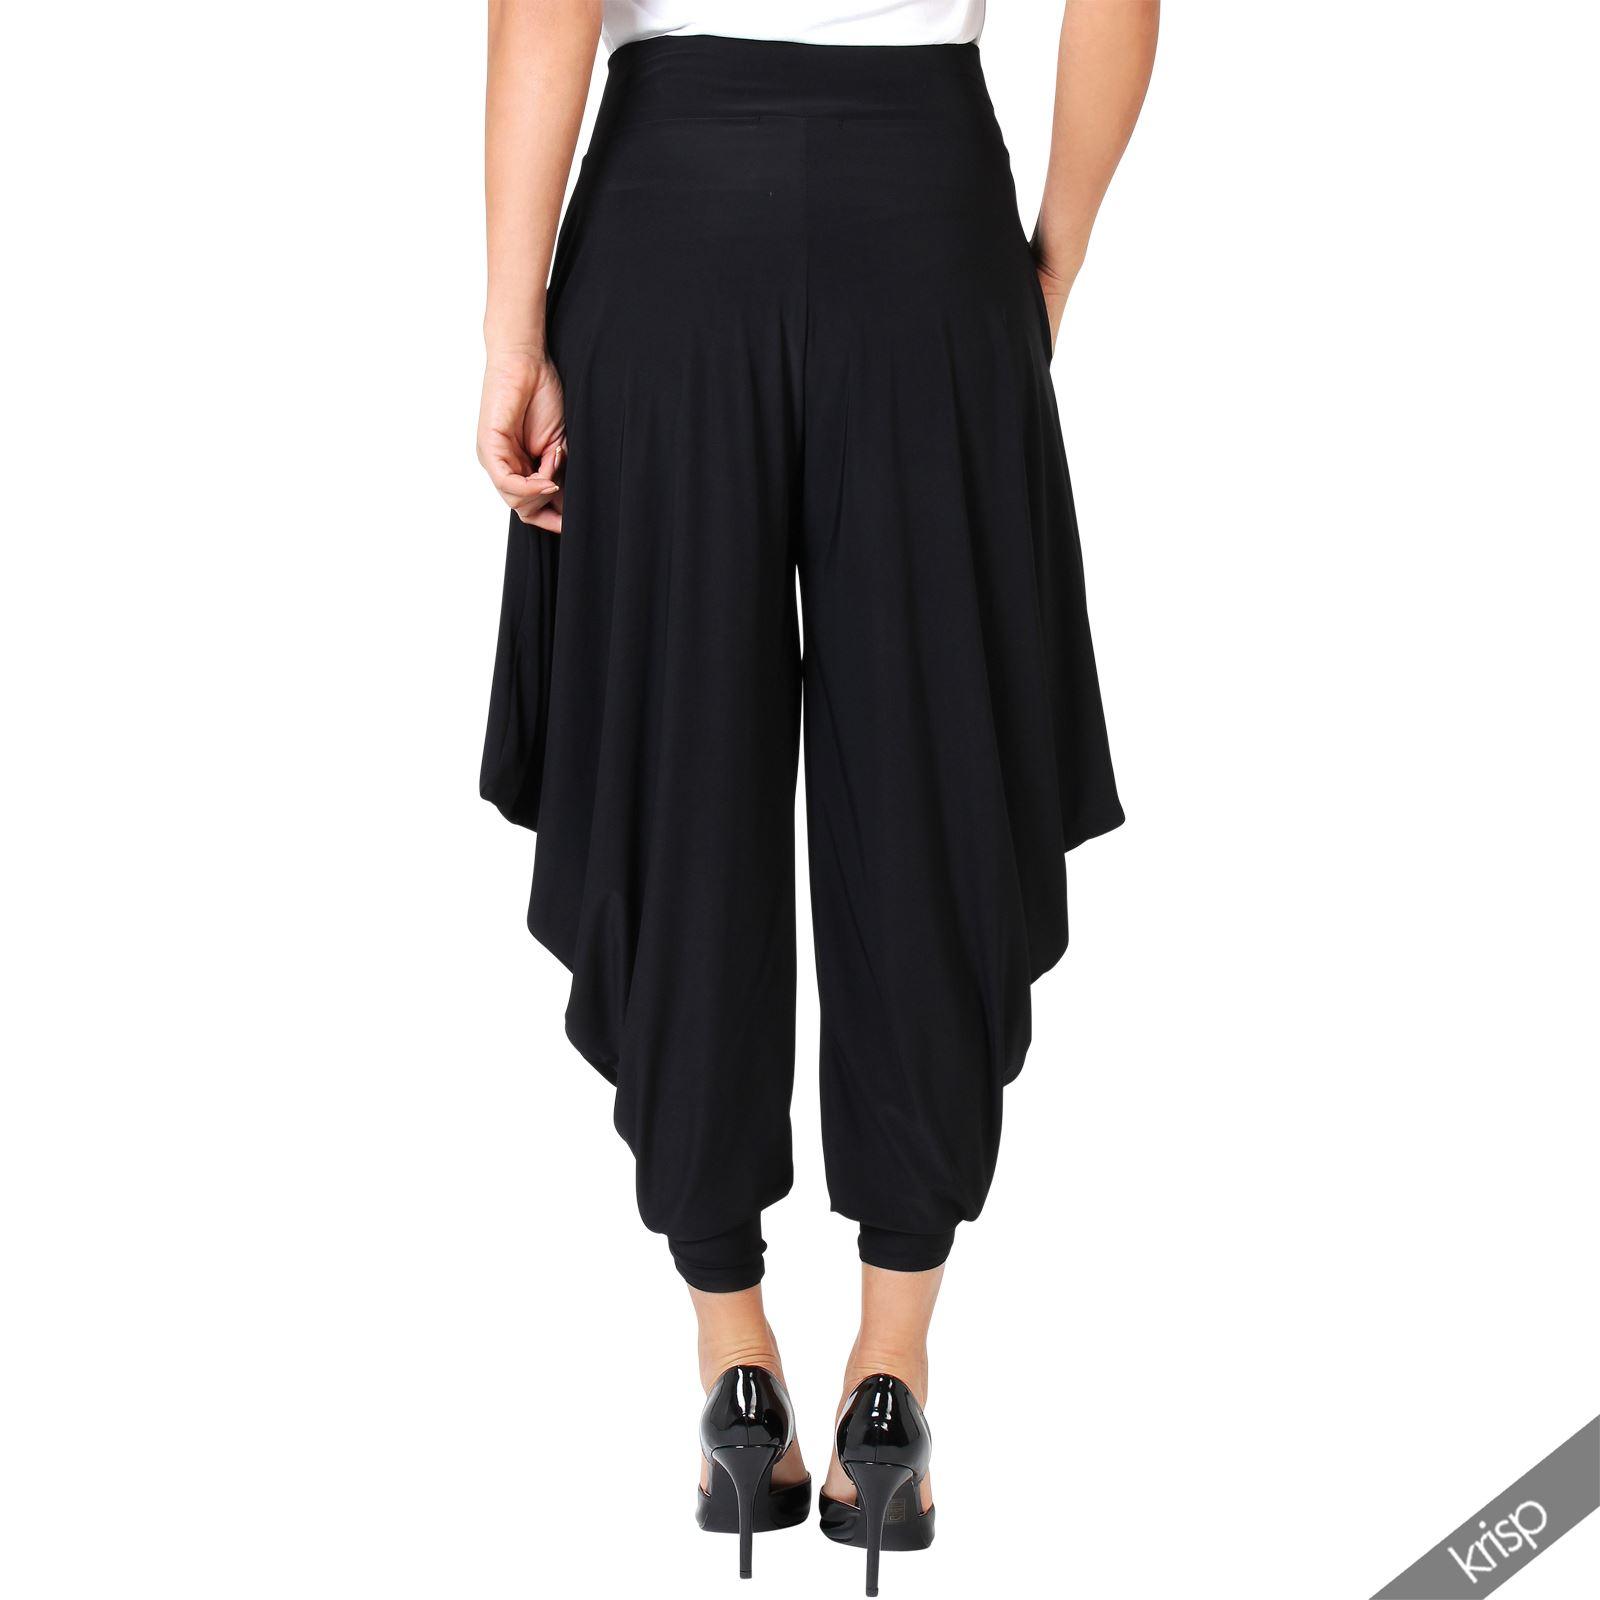 Femme pantalon harem aladin sarouel ample yoga d tente grande taille gypsy ebay - Pantalon ample femme ...